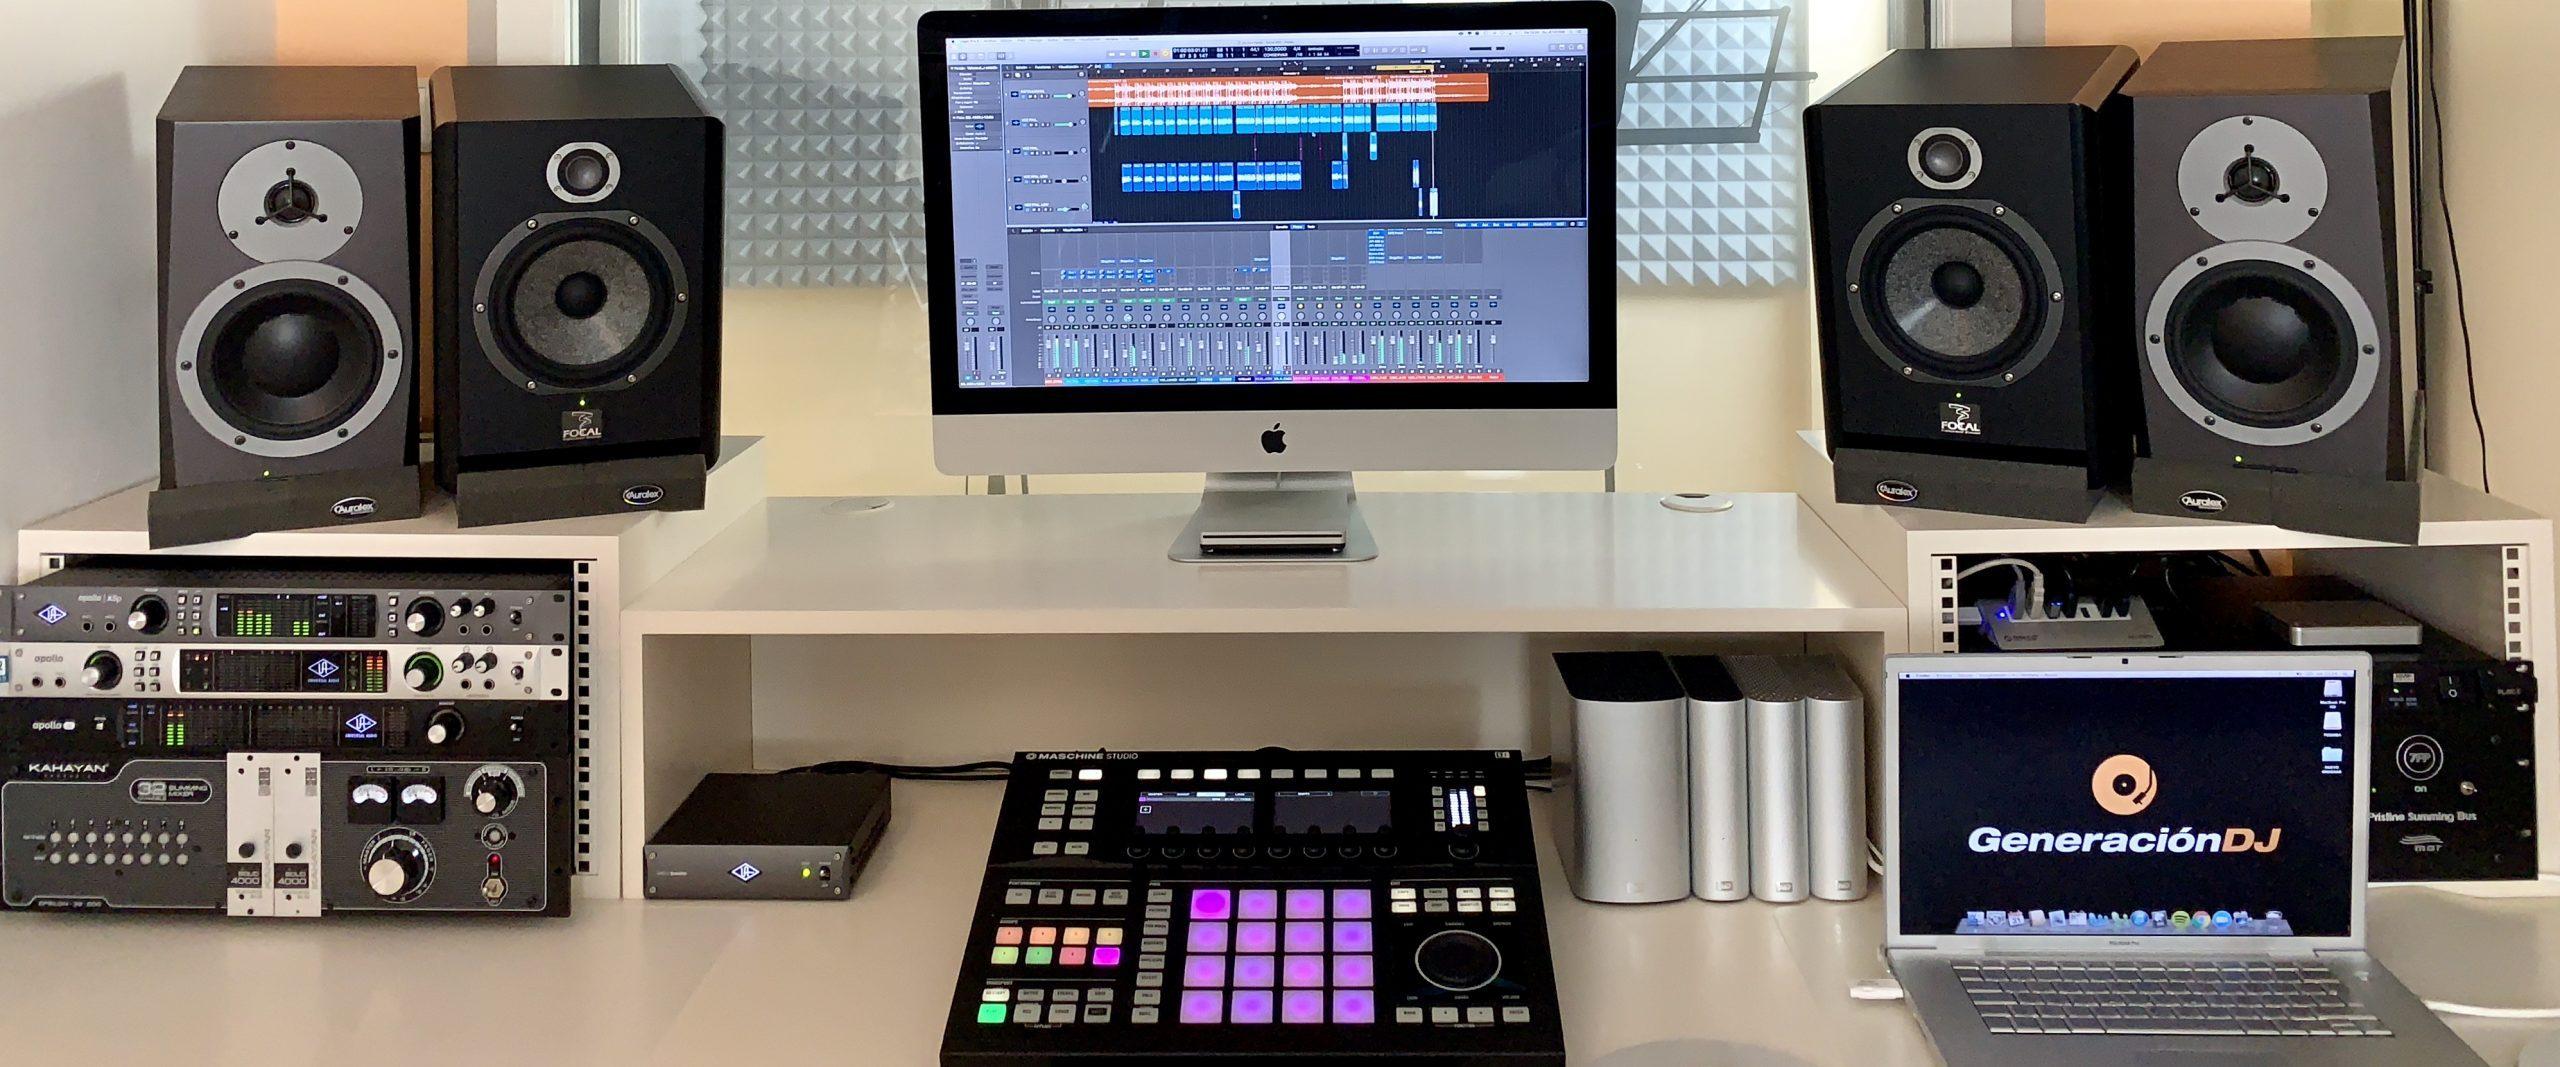 Jótatebe Recording Studio 01 (2020)